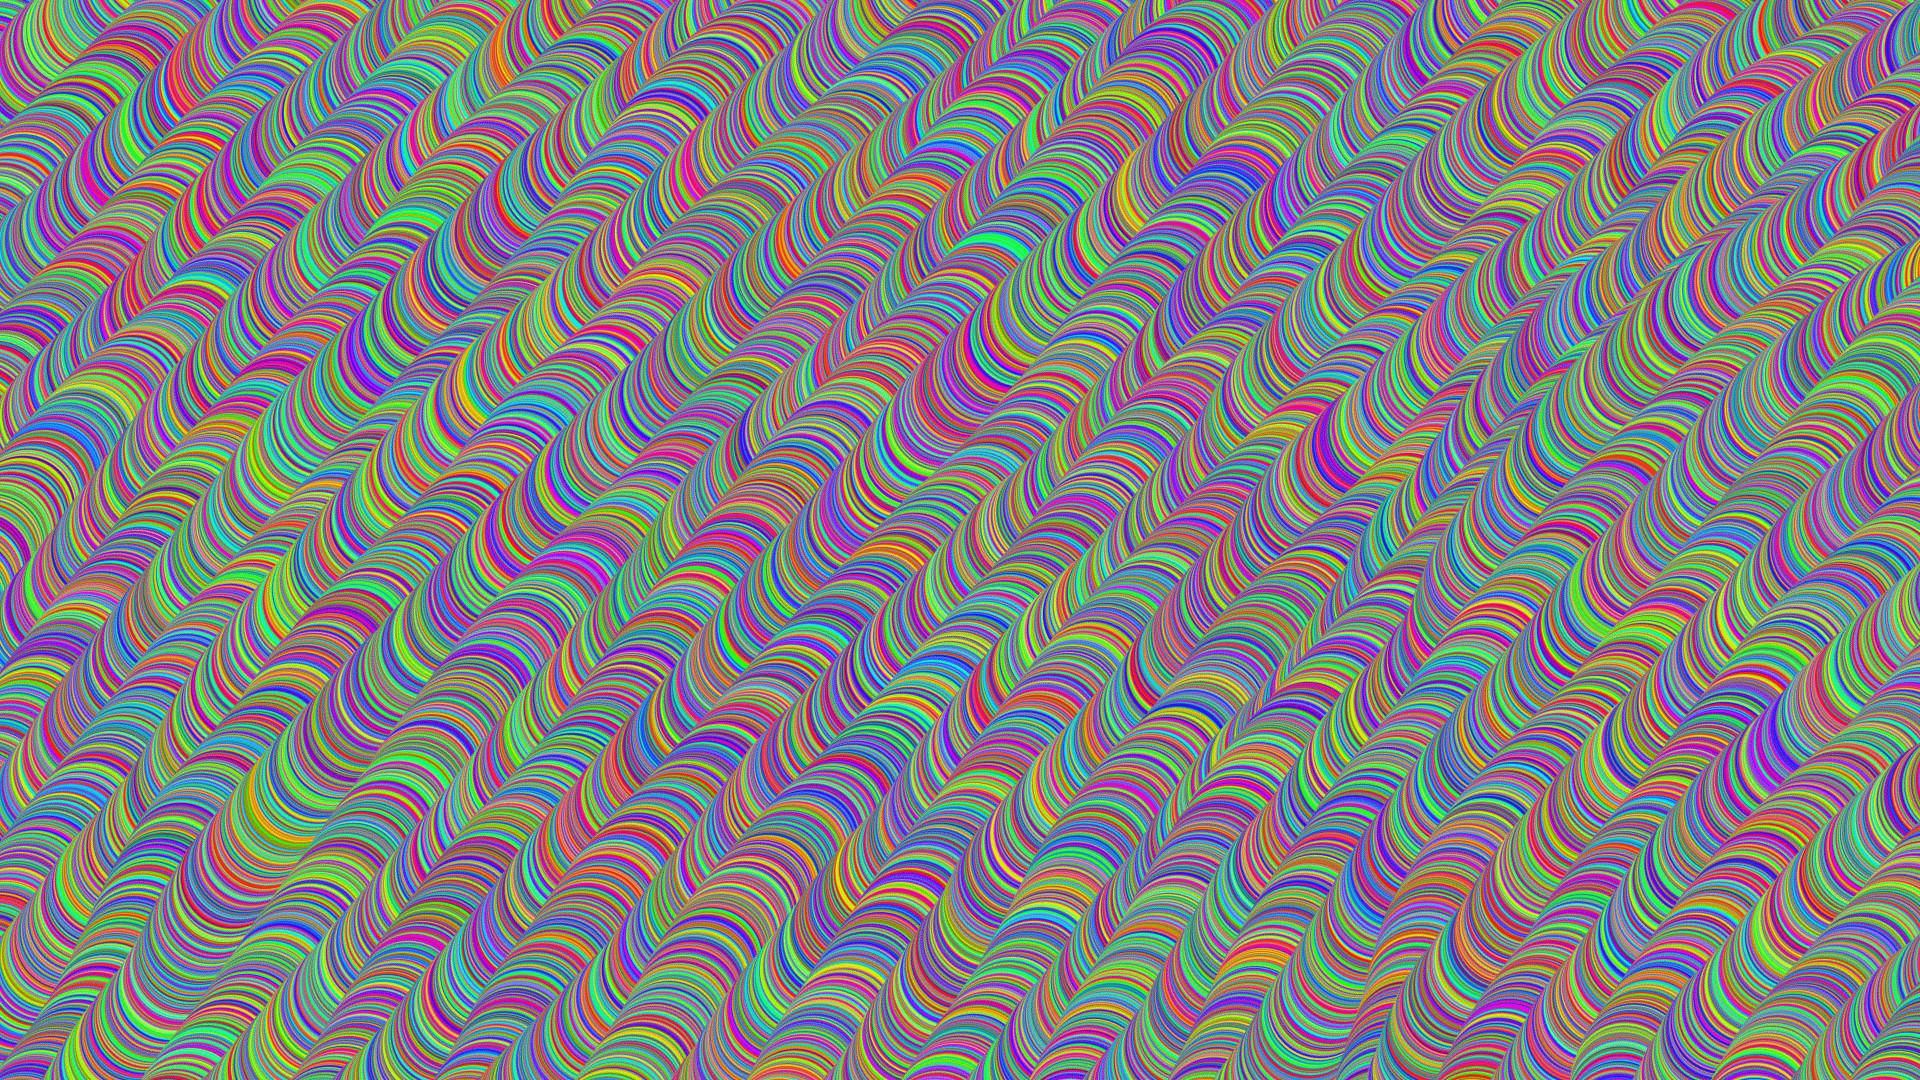 Trippy Background download